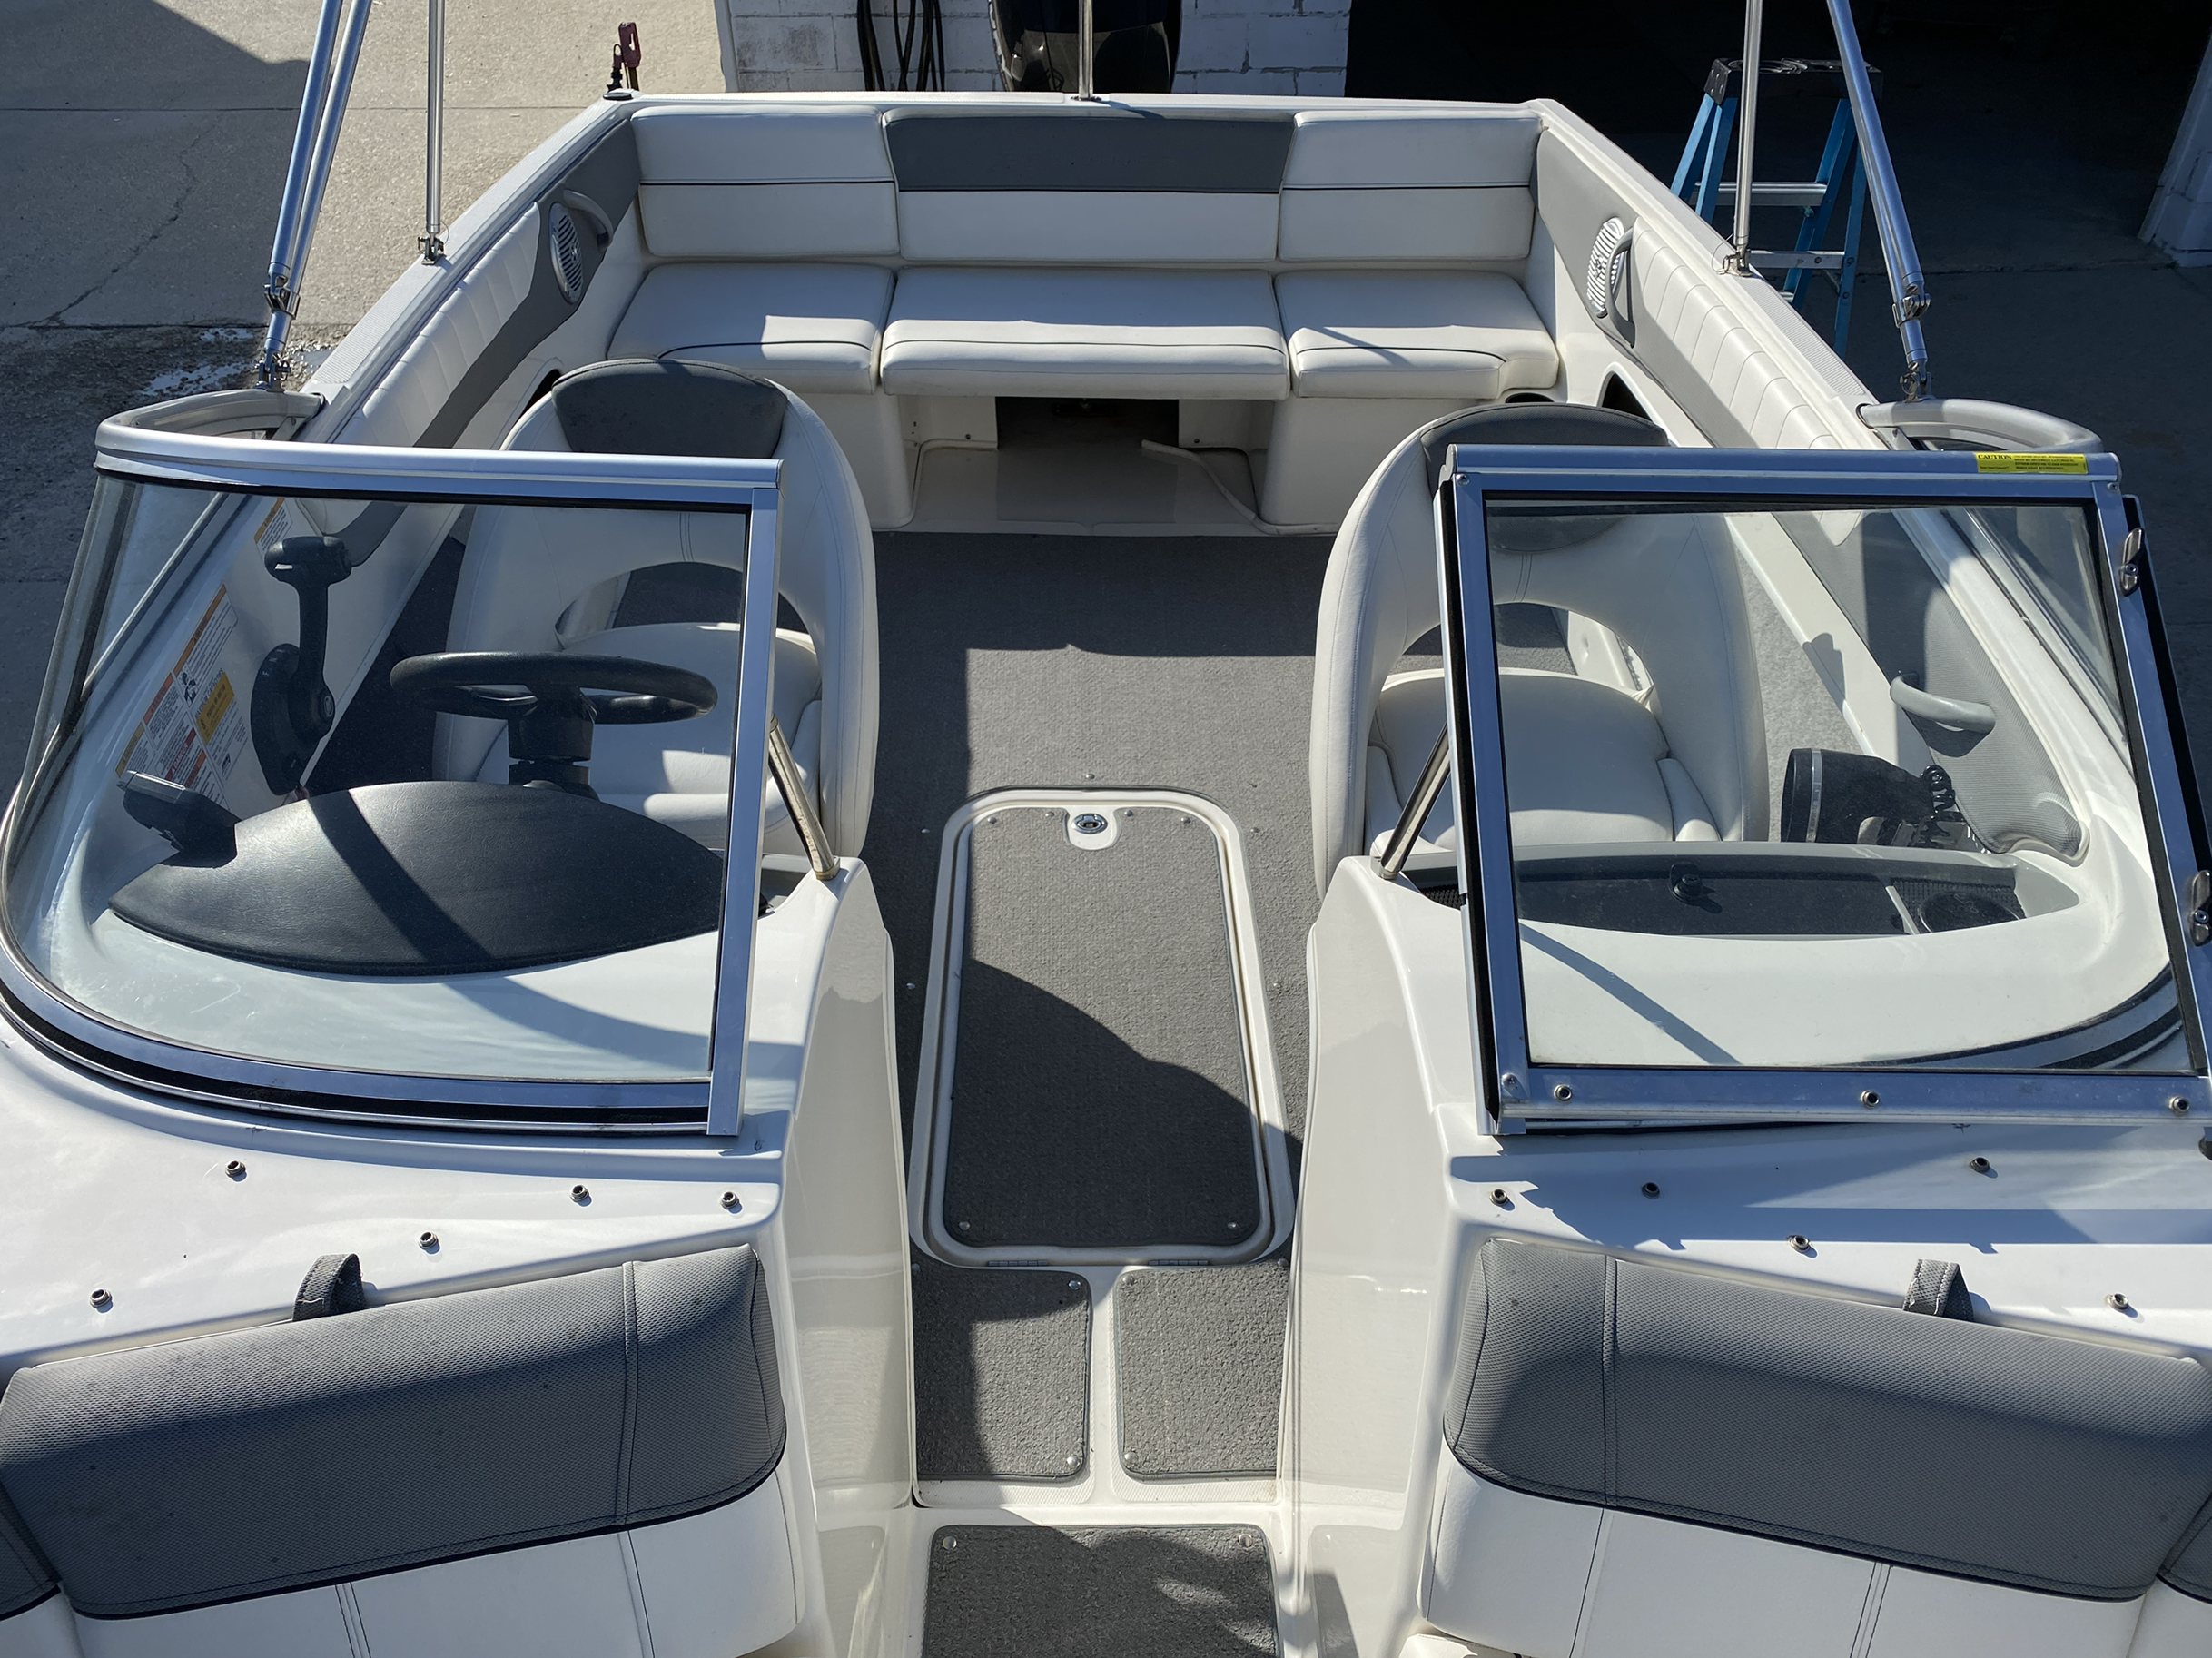 2014 Bayliner boat for sale, model of the boat is 190 Bowrider & Image # 5 of 10